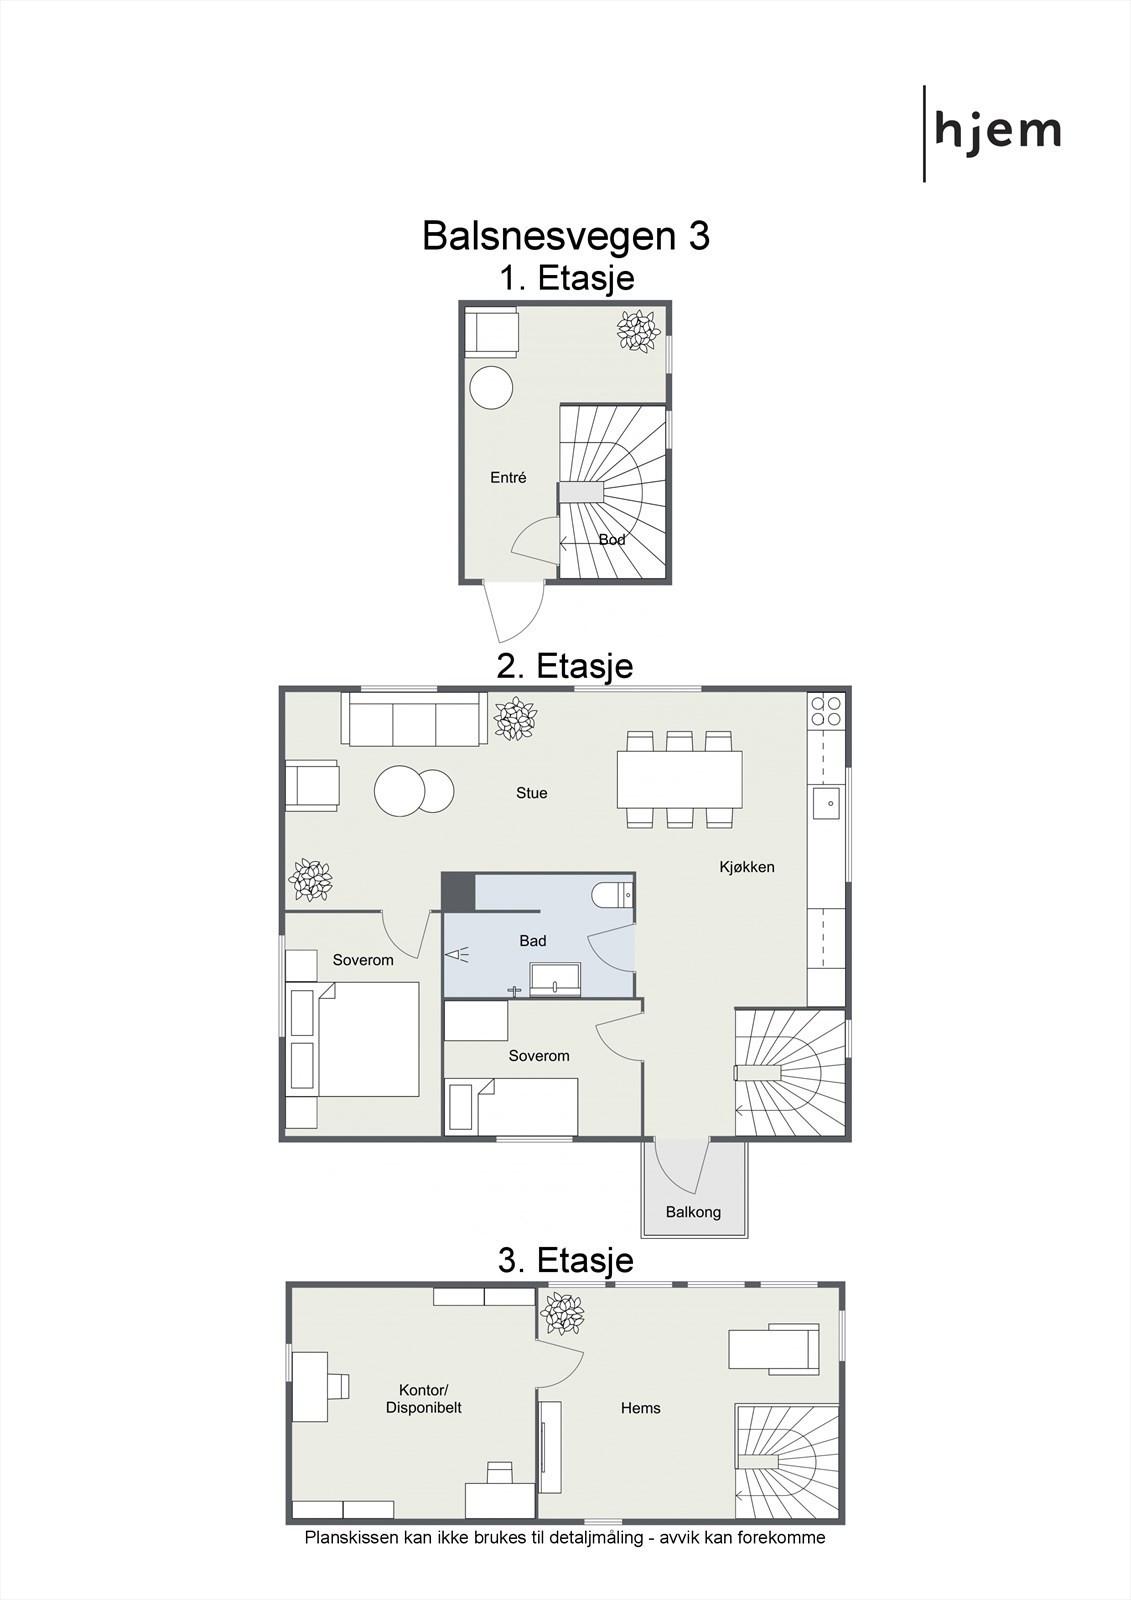 Project letterhead - Balsnesvegen 3 - 2D Floor Plan.jpg